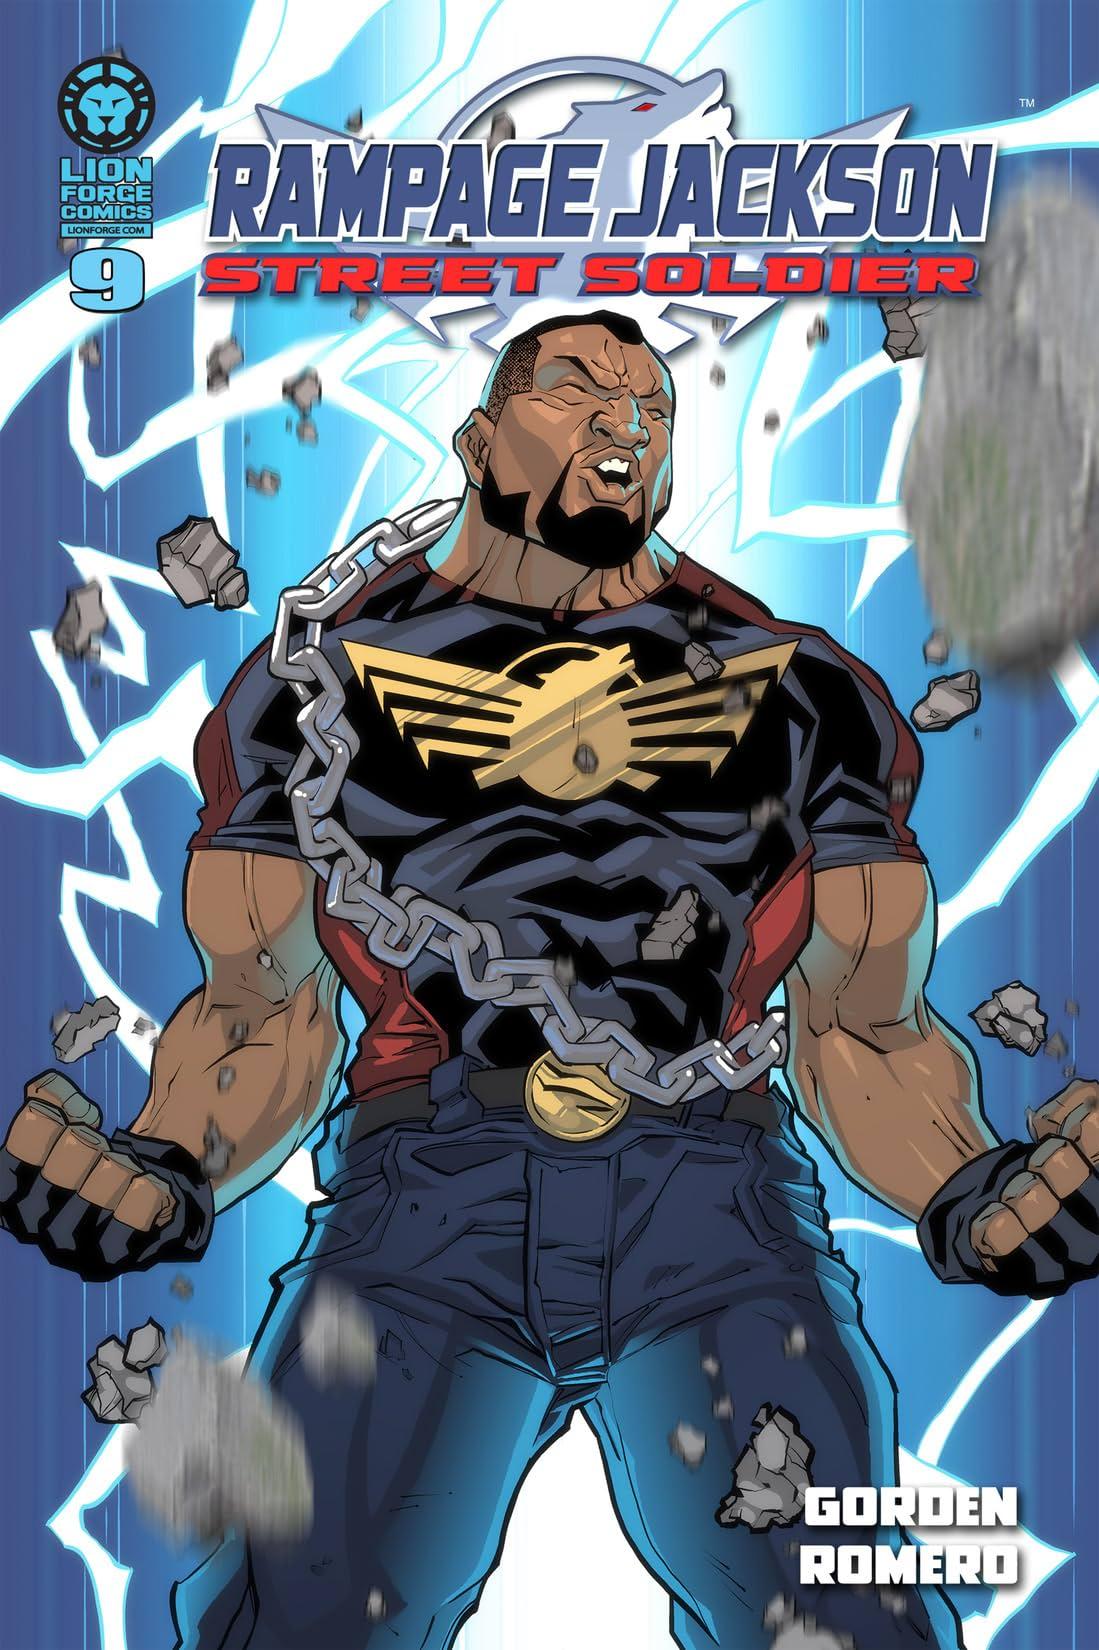 Rampage Jackson: Street Soldier #9